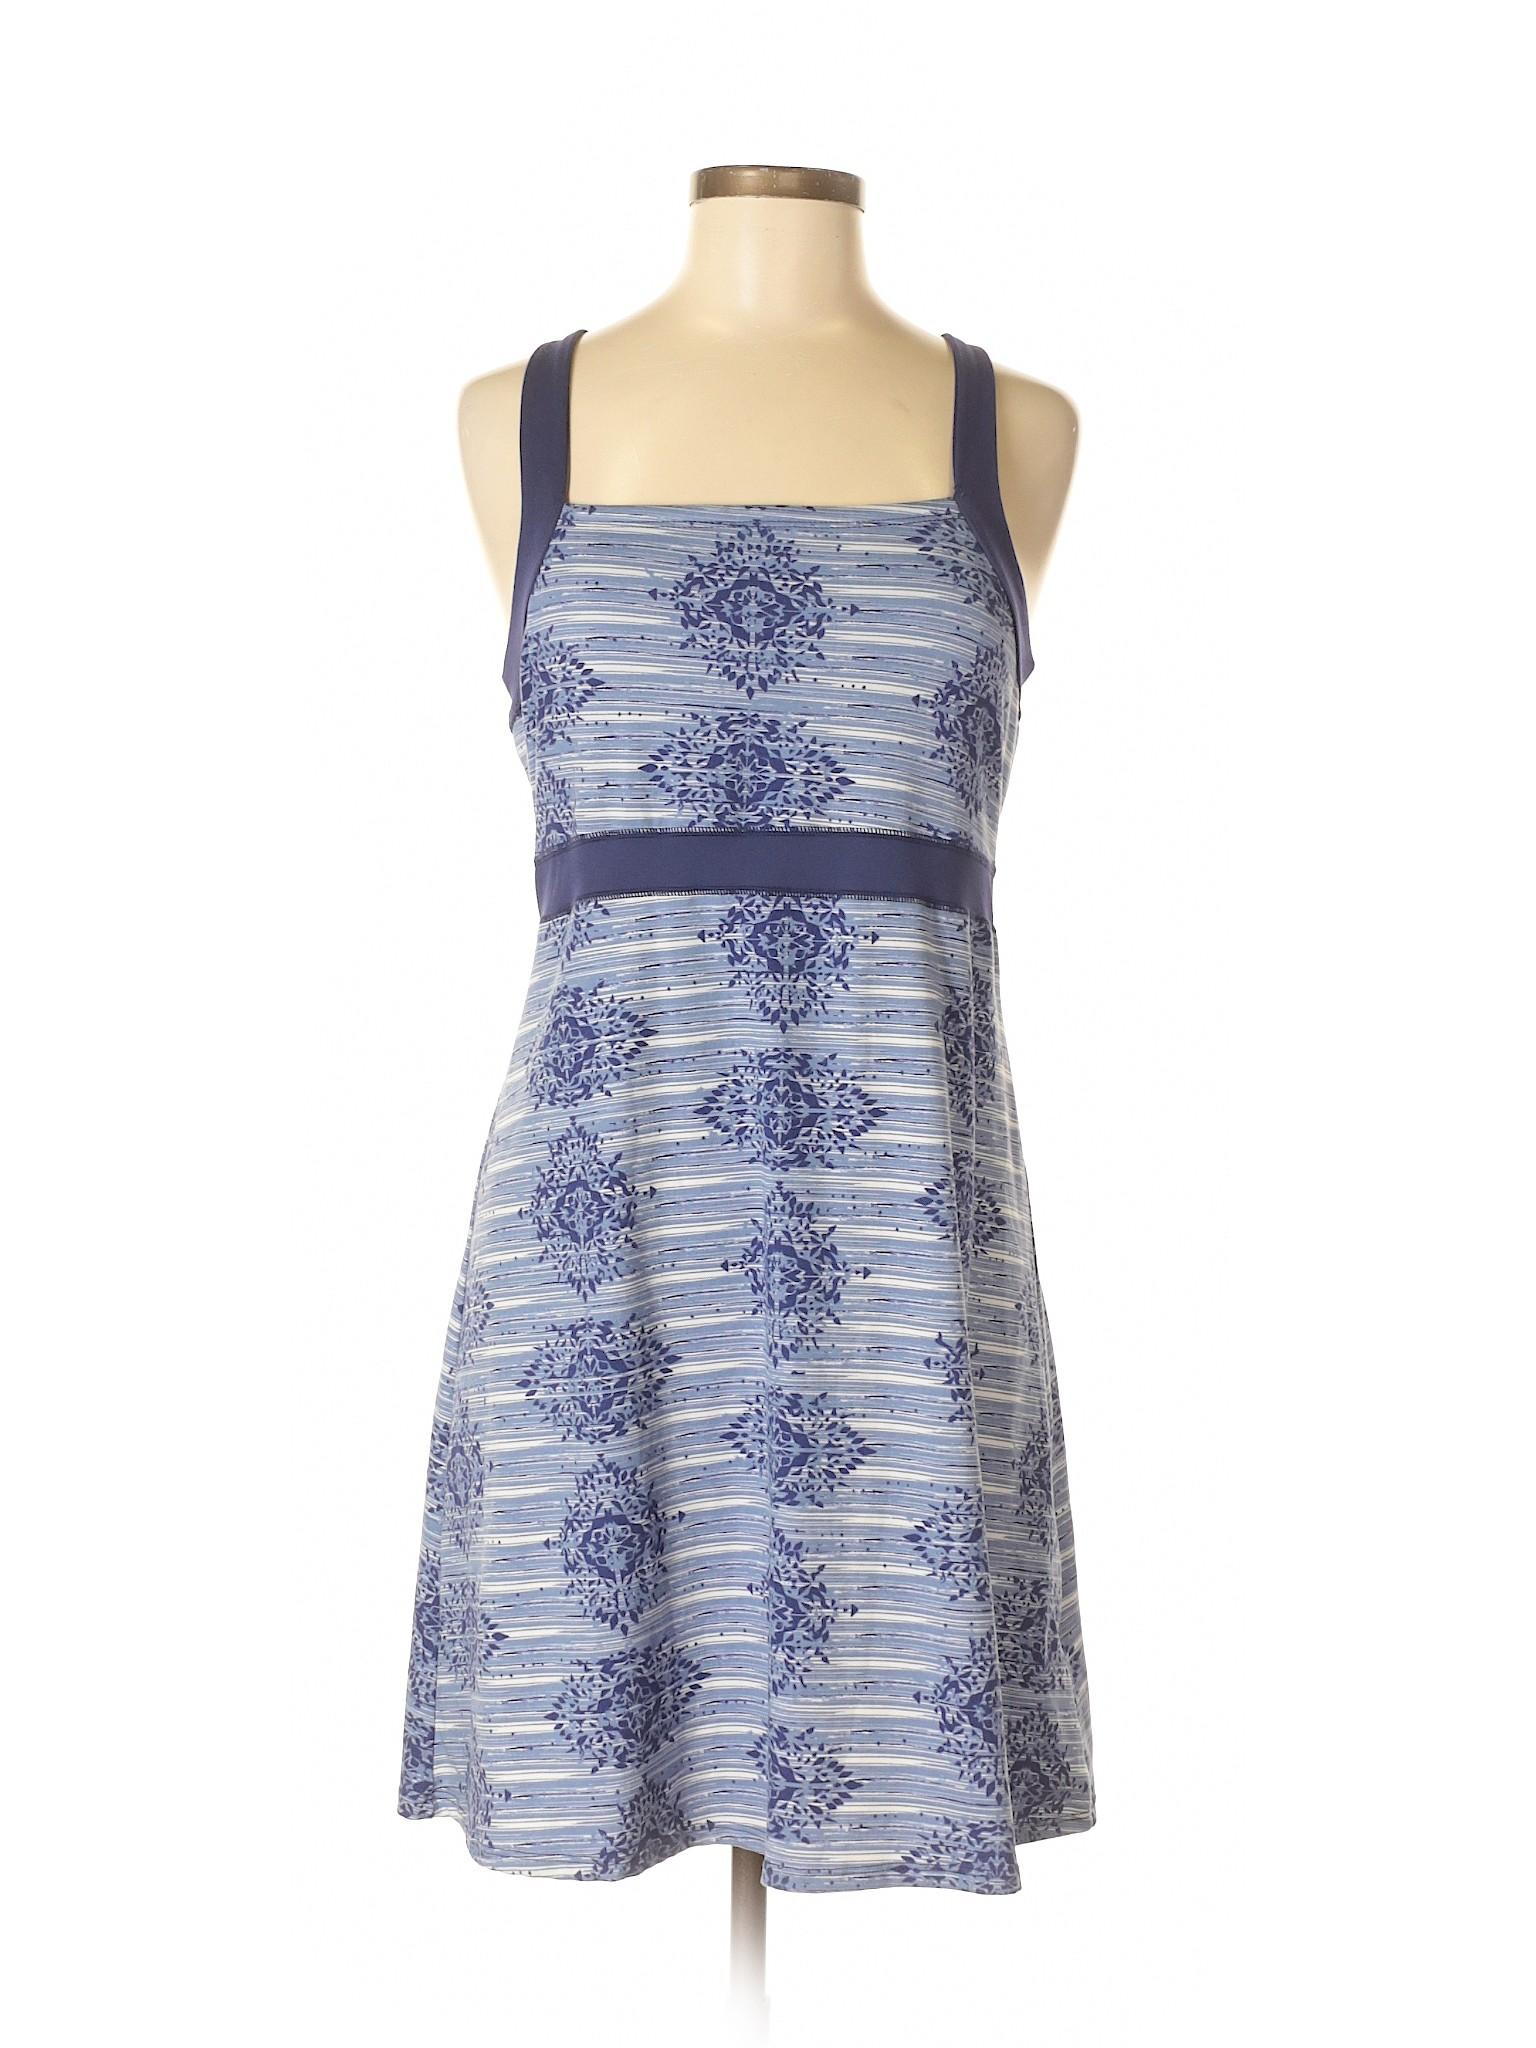 Soybu Casual Selling Selling Soybu Soybu Casual Dress Casual Dress Selling vvpRwqP